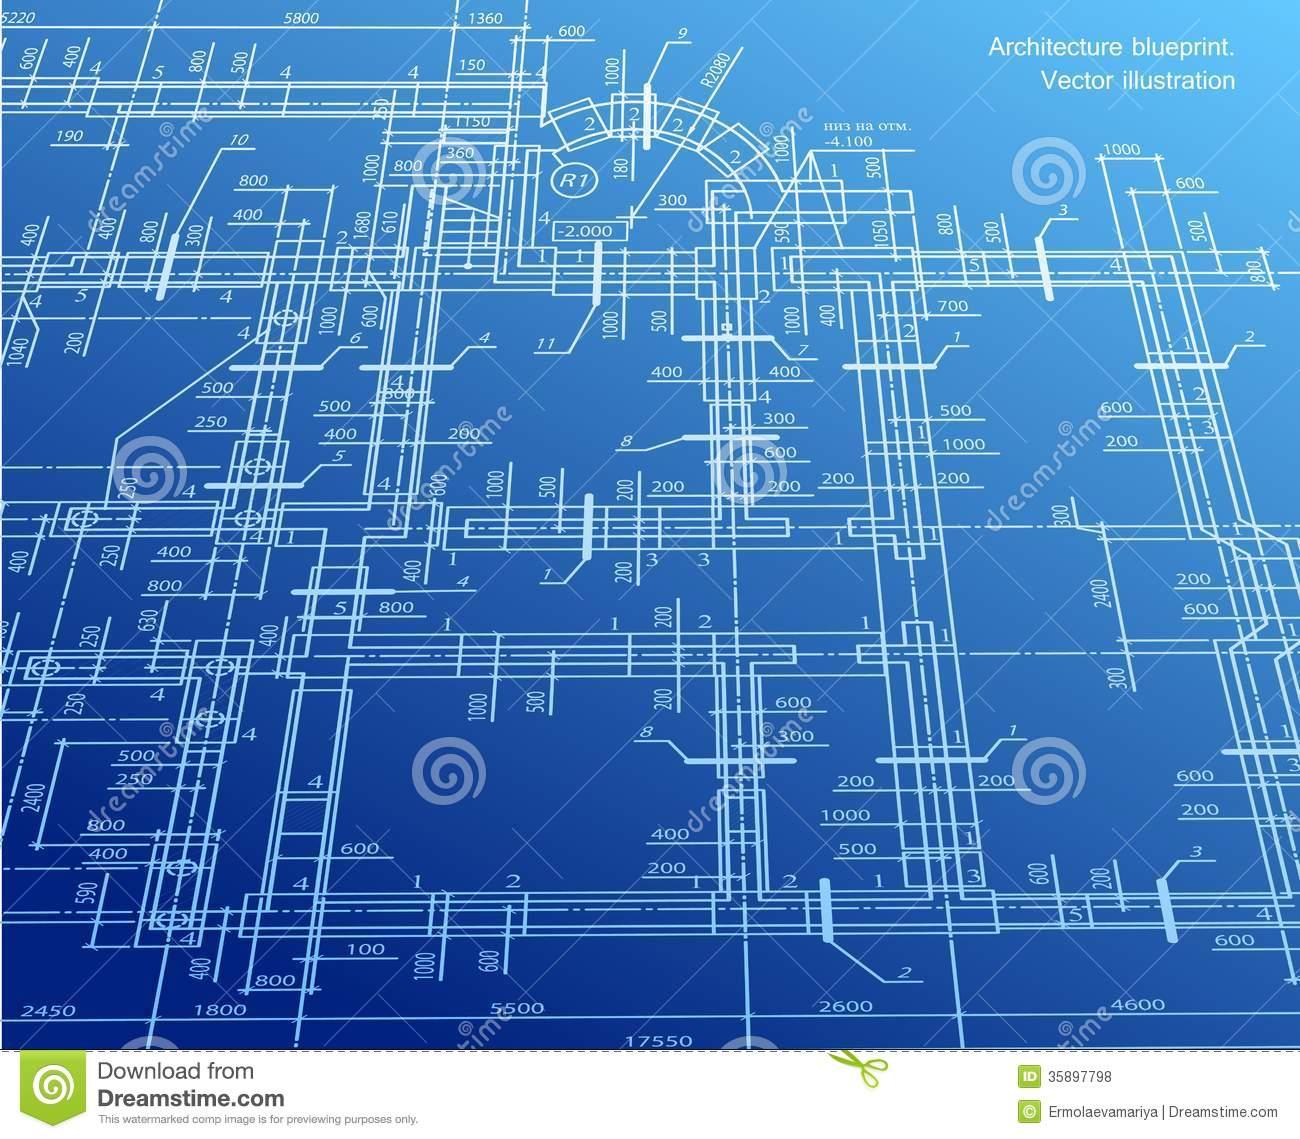 41+ Construction Blueprint Wallpaper on WallpaperSafari